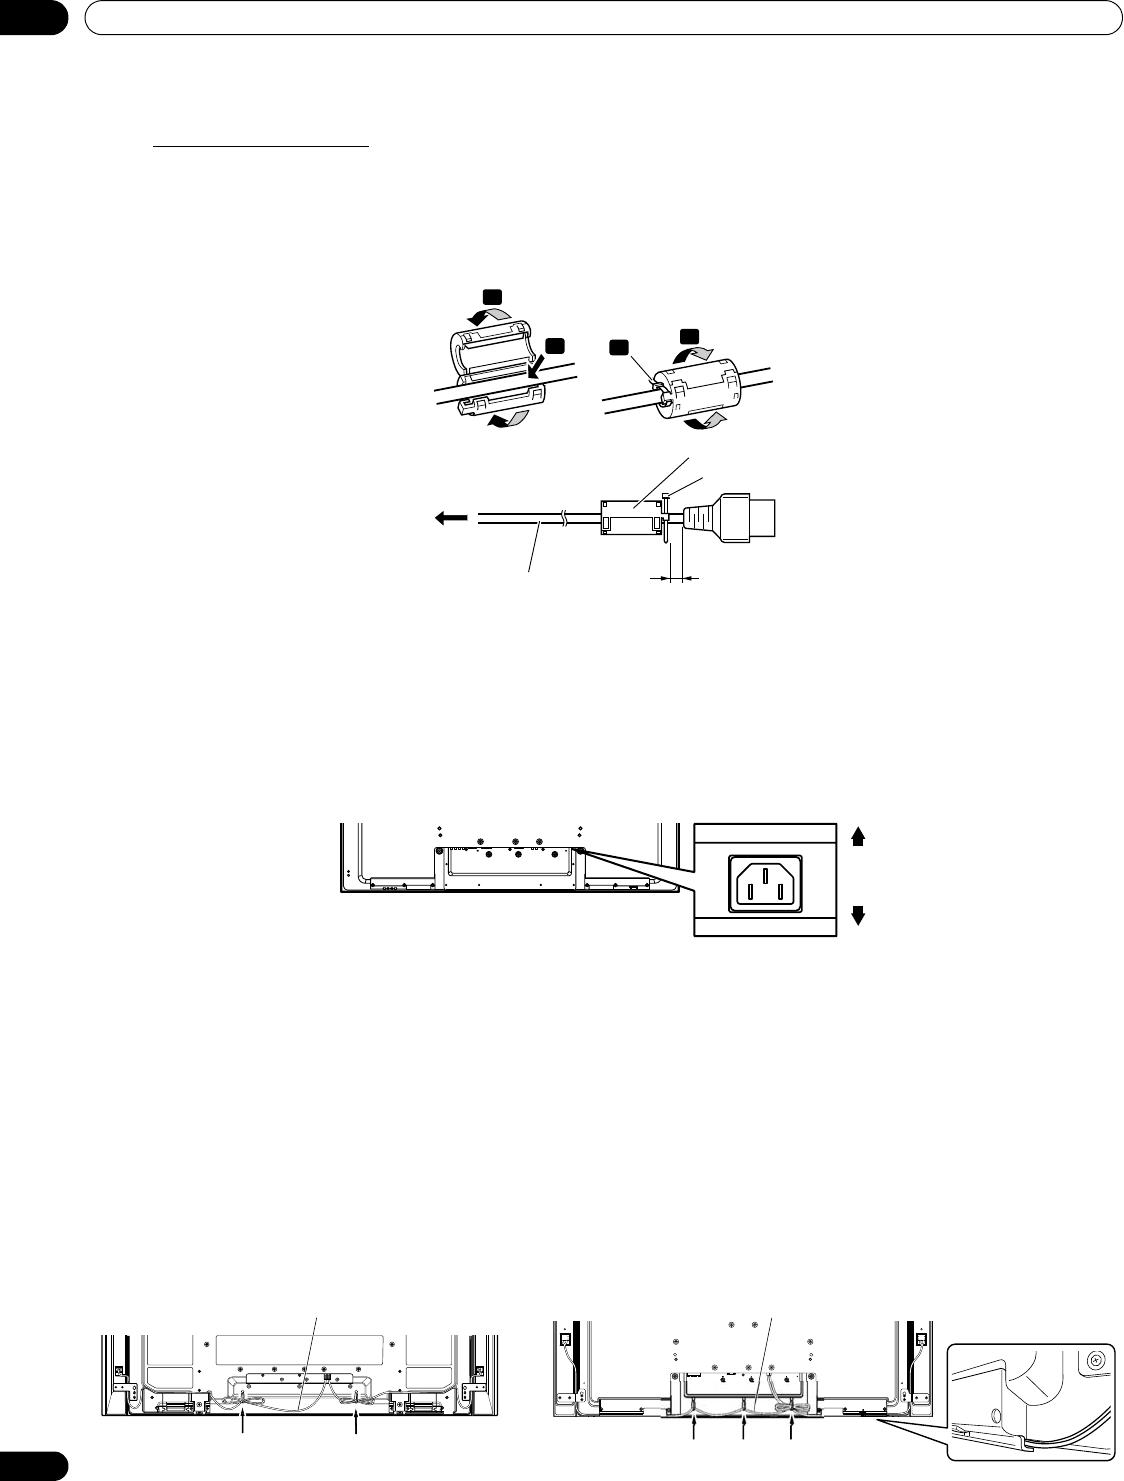 Handleiding Pioneer Krp 600m Pagina 126 Van 433 Espanôl Italiano